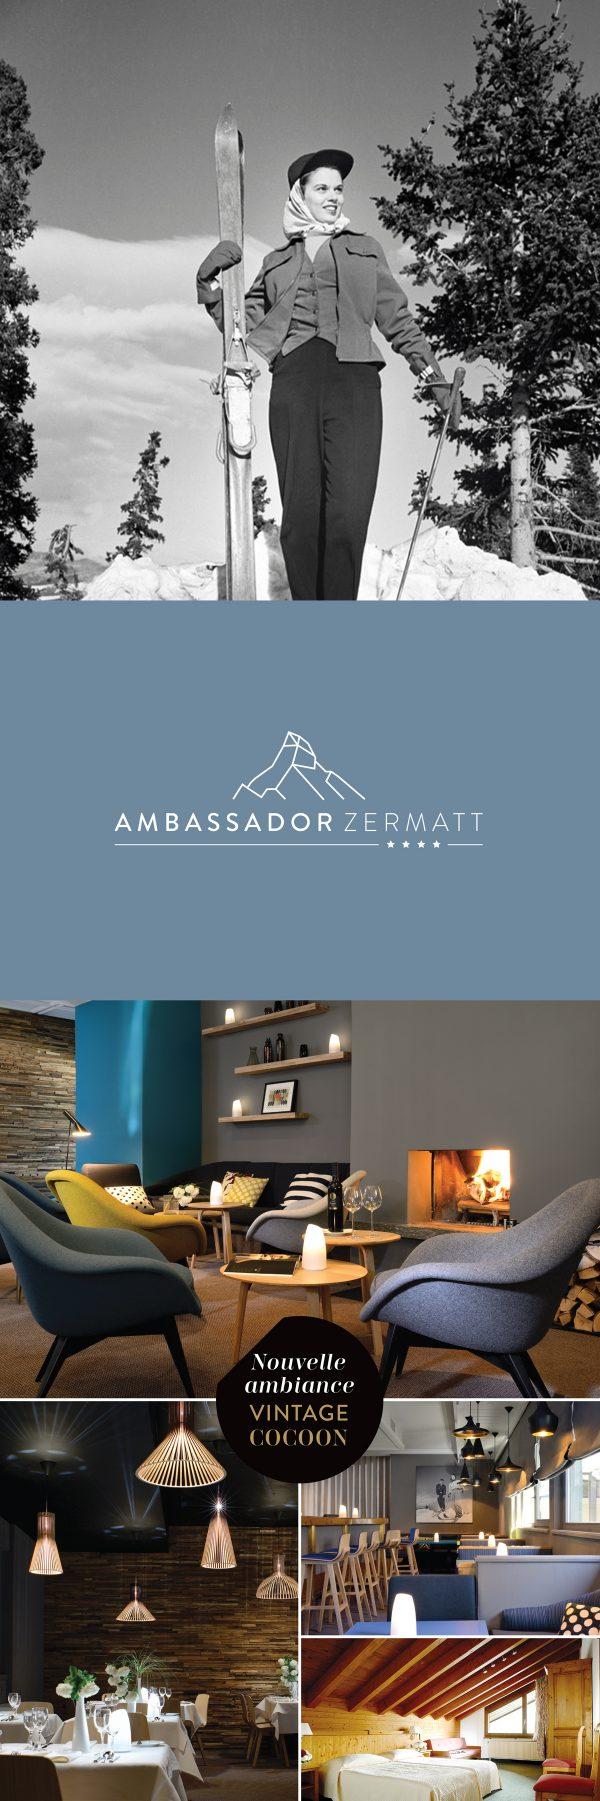 Ambassador Zermatt